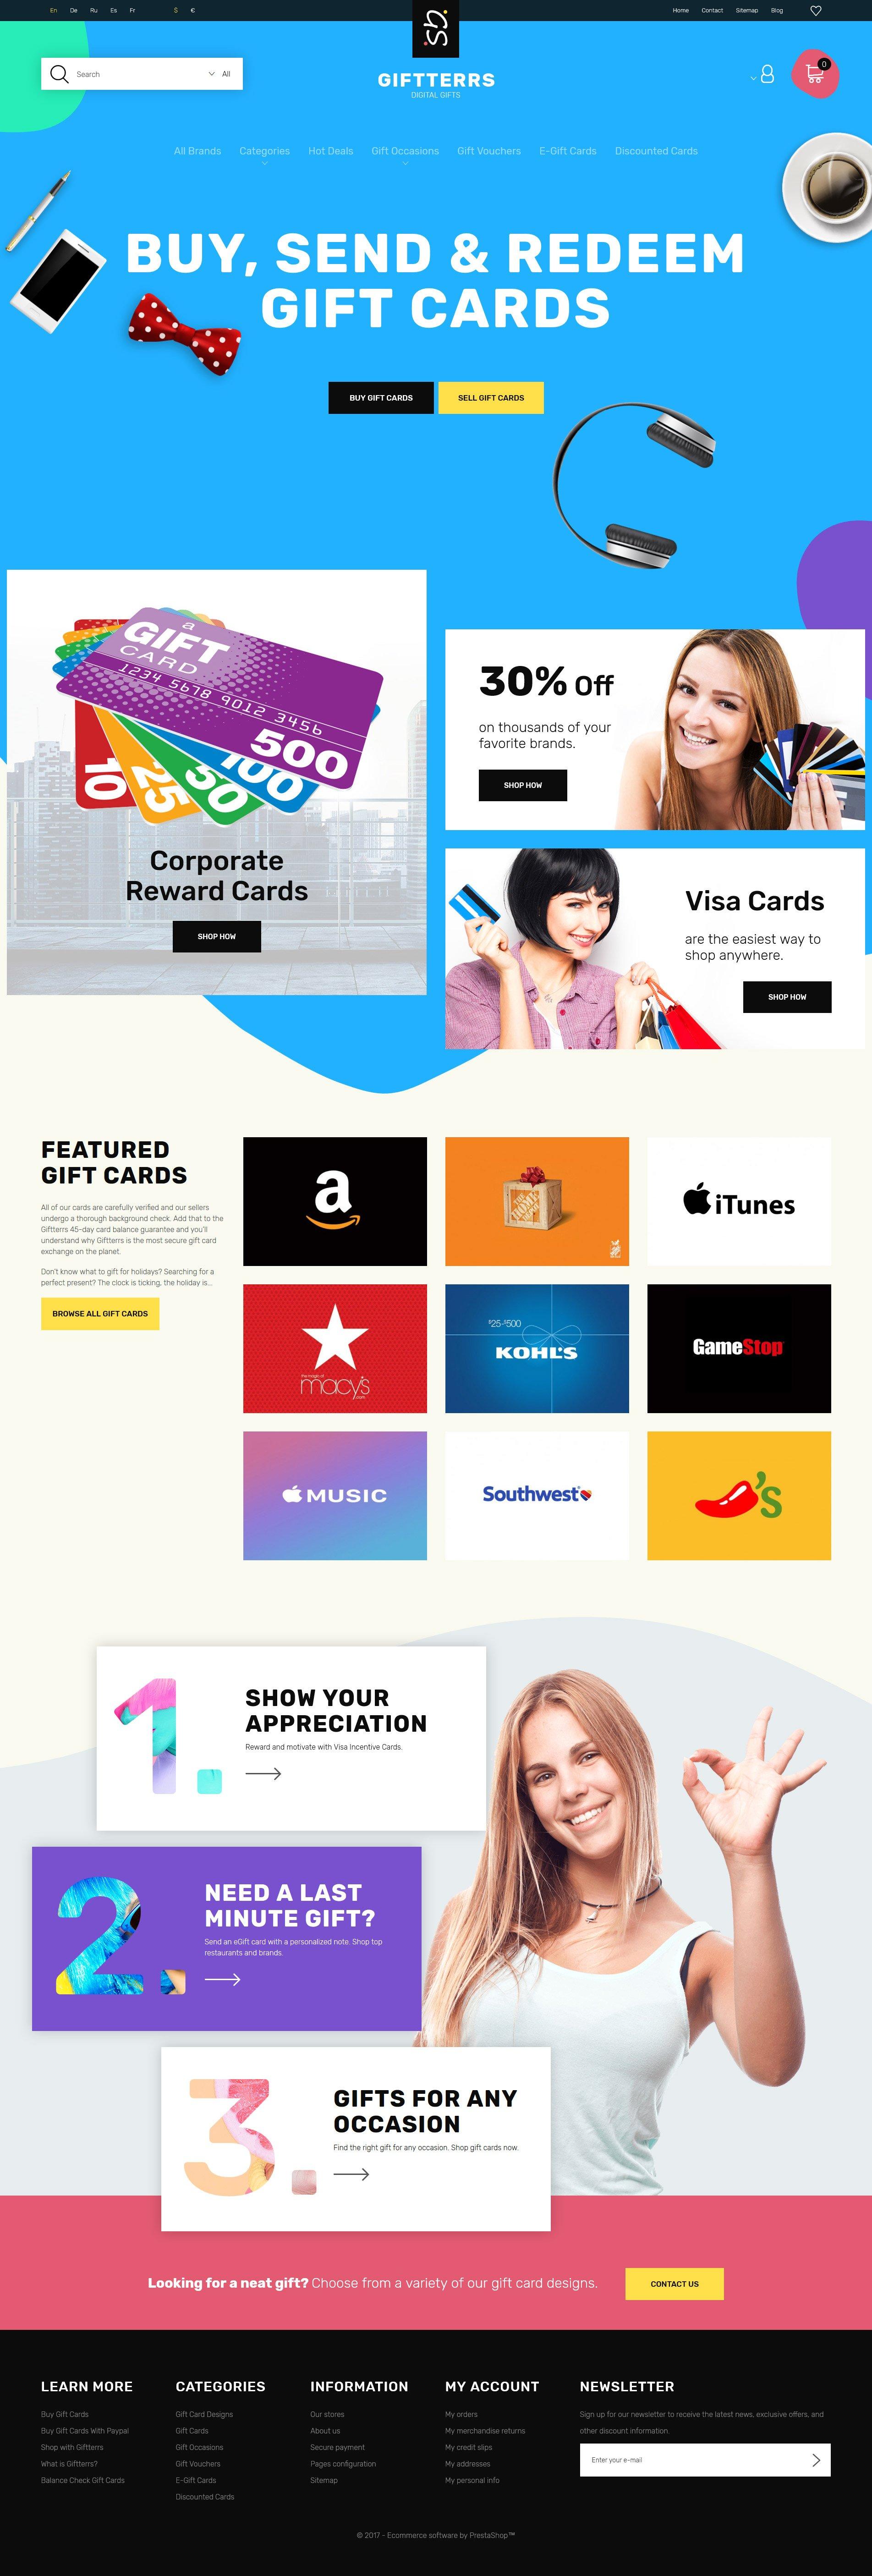 Responsywny szablon PrestaShop Giftterrs - Gift Cards for Any Purpose #63340 - zrzut ekranu